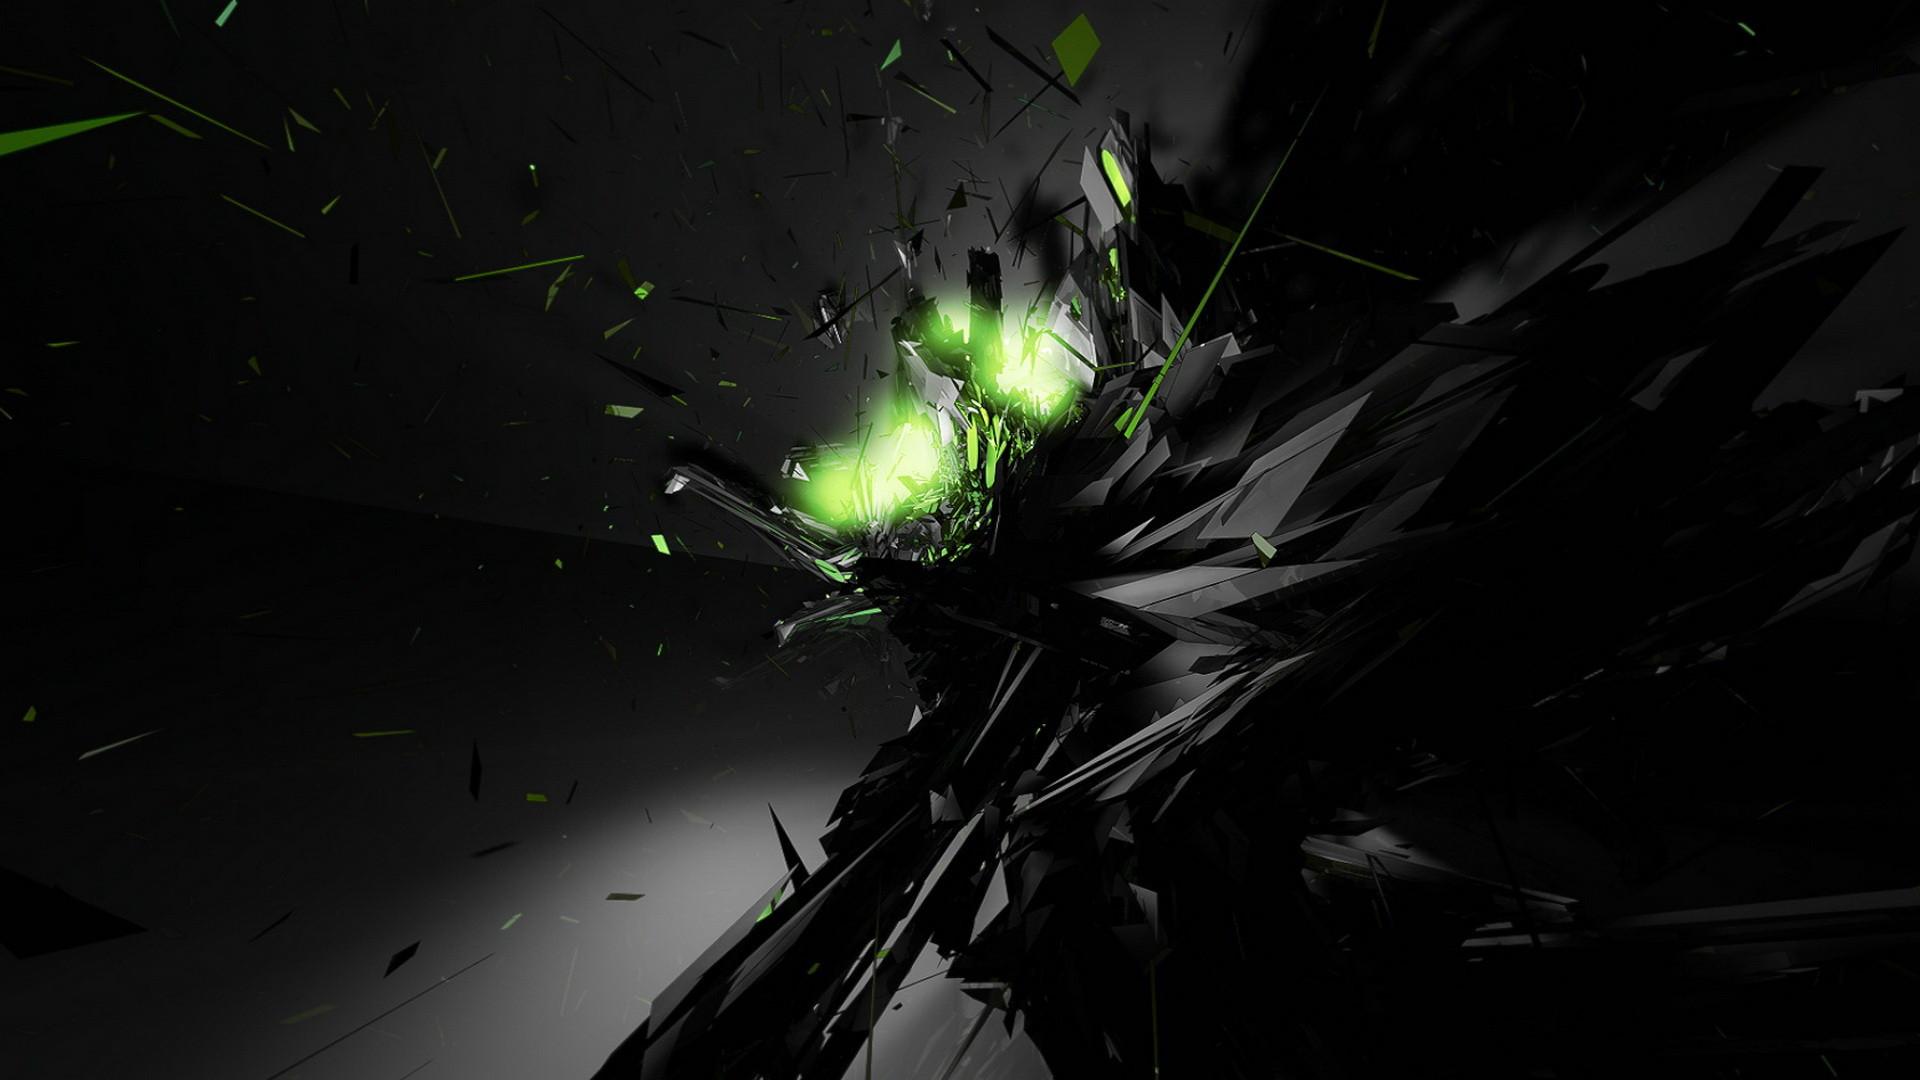 Dark Abstract 1920×1080